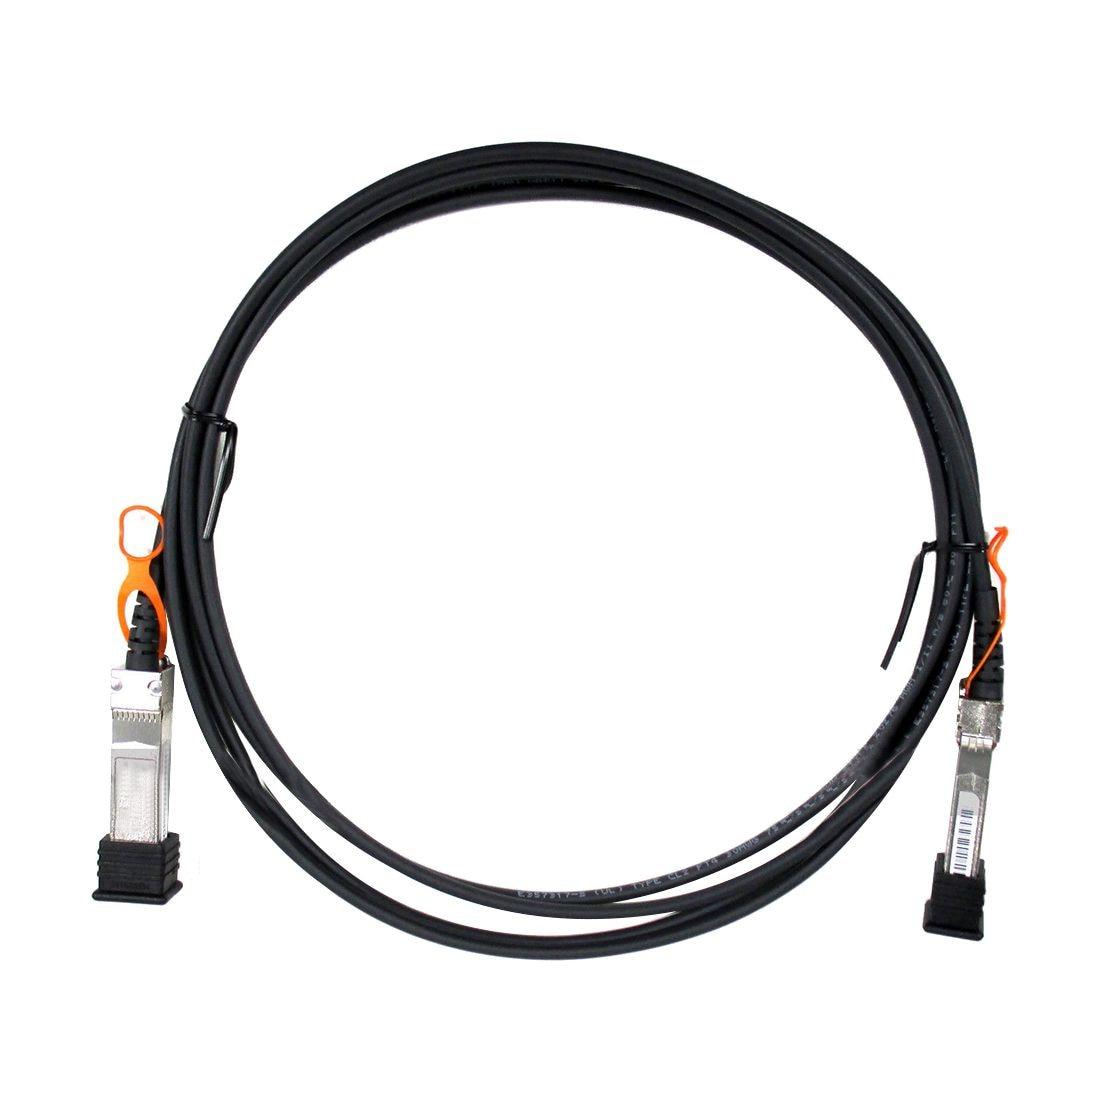 SFP-H10GB-CU3M 3 Meter 10GbE Twinax high speed CableSFP-H10GB-CU3M 3 Meter 10GbE Twinax high speed Cable